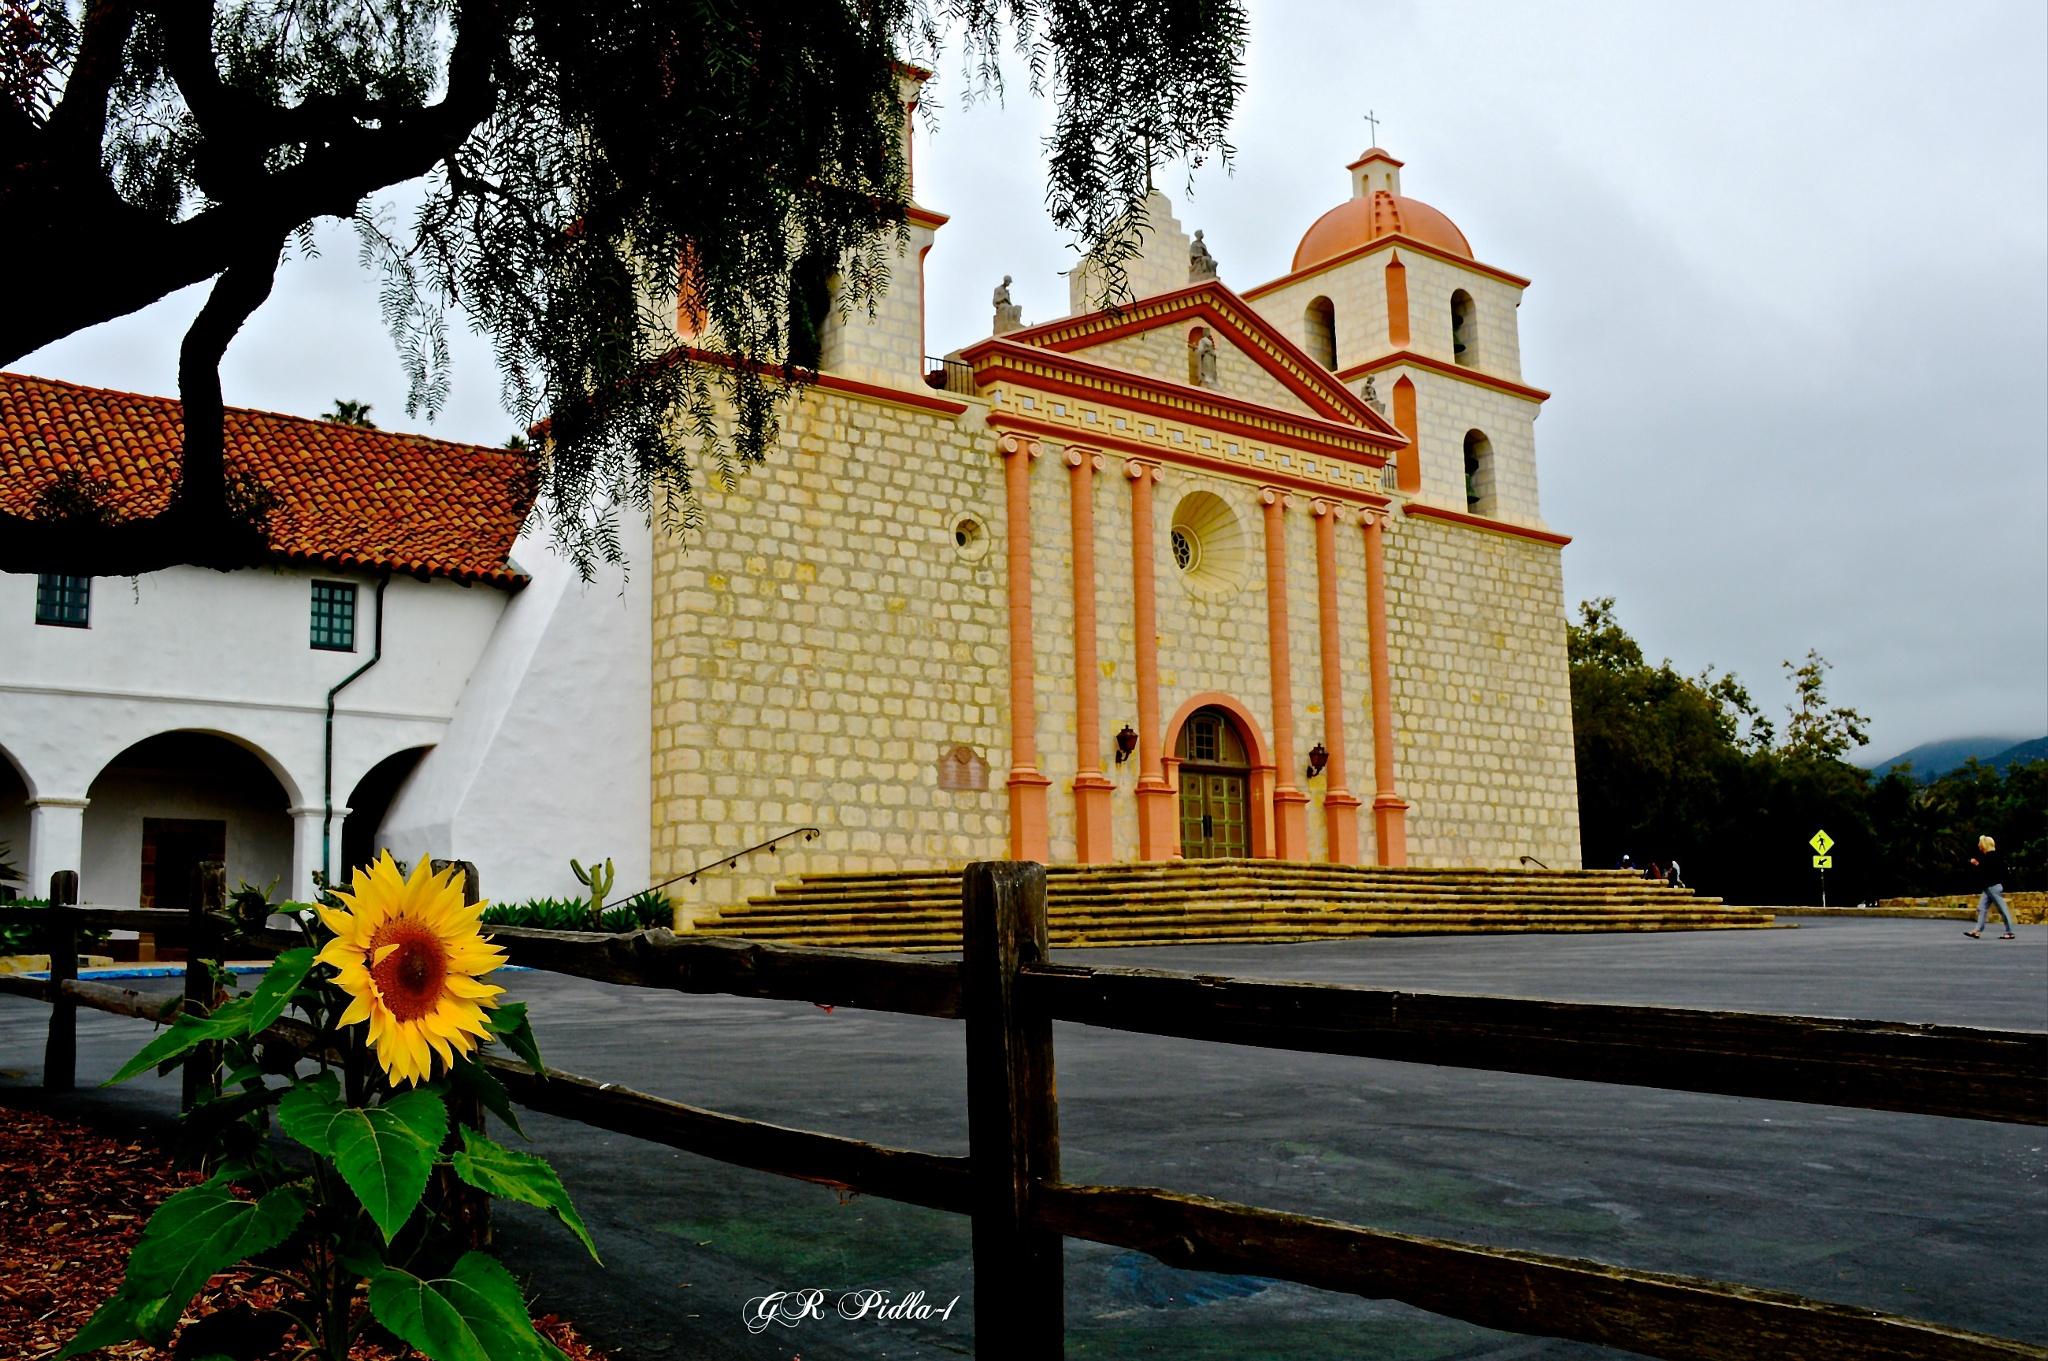 Mission Santa Barbara Church by Gina  Alwaysmile (*_*)